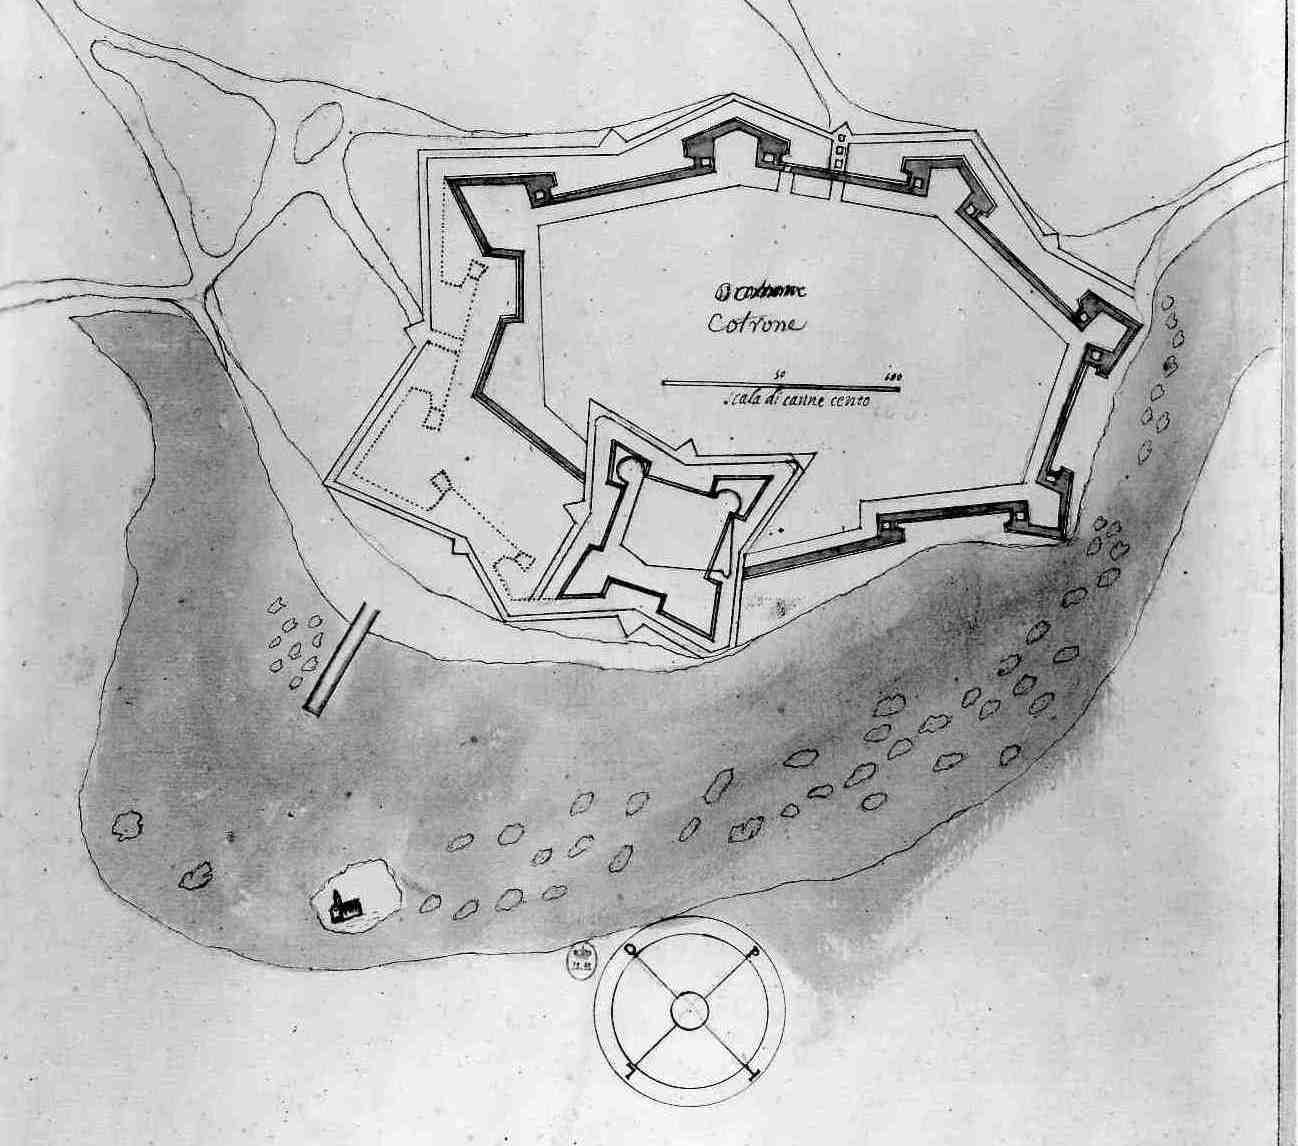 Pianta di Crotone